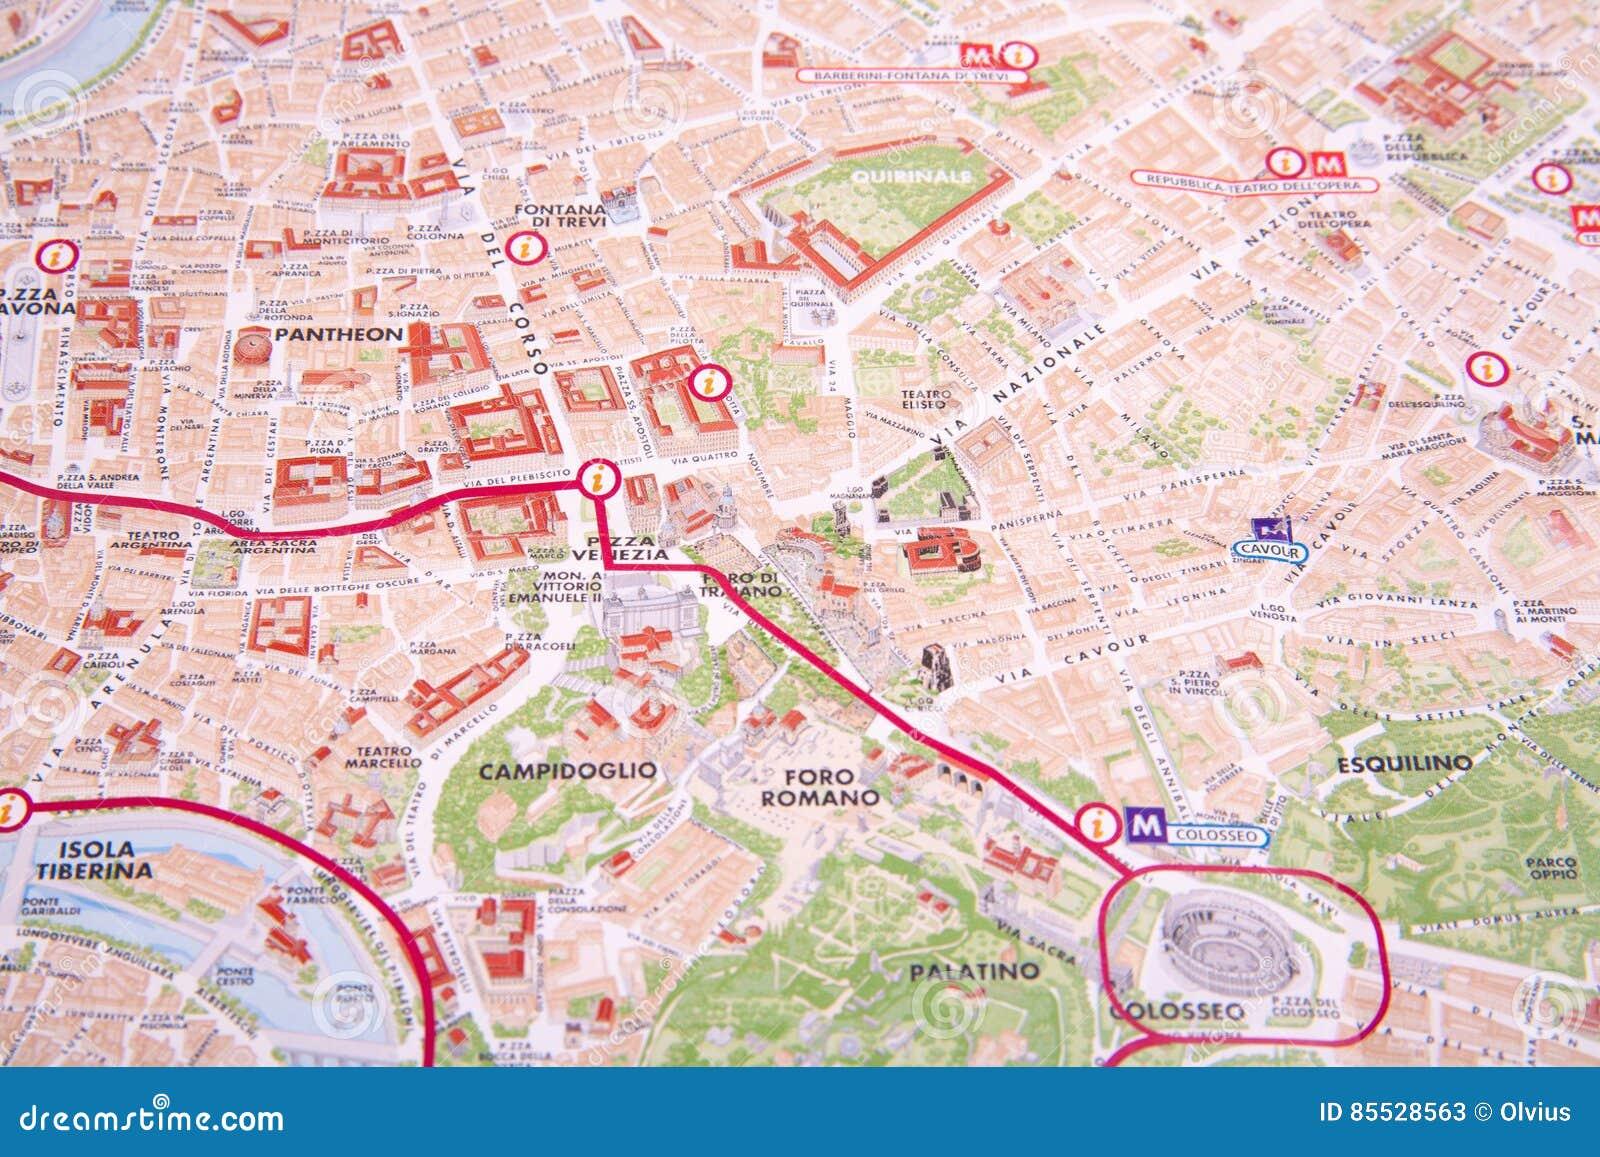 The Rome Map Stock Image Image Of Europe Pushpin Mediterranean